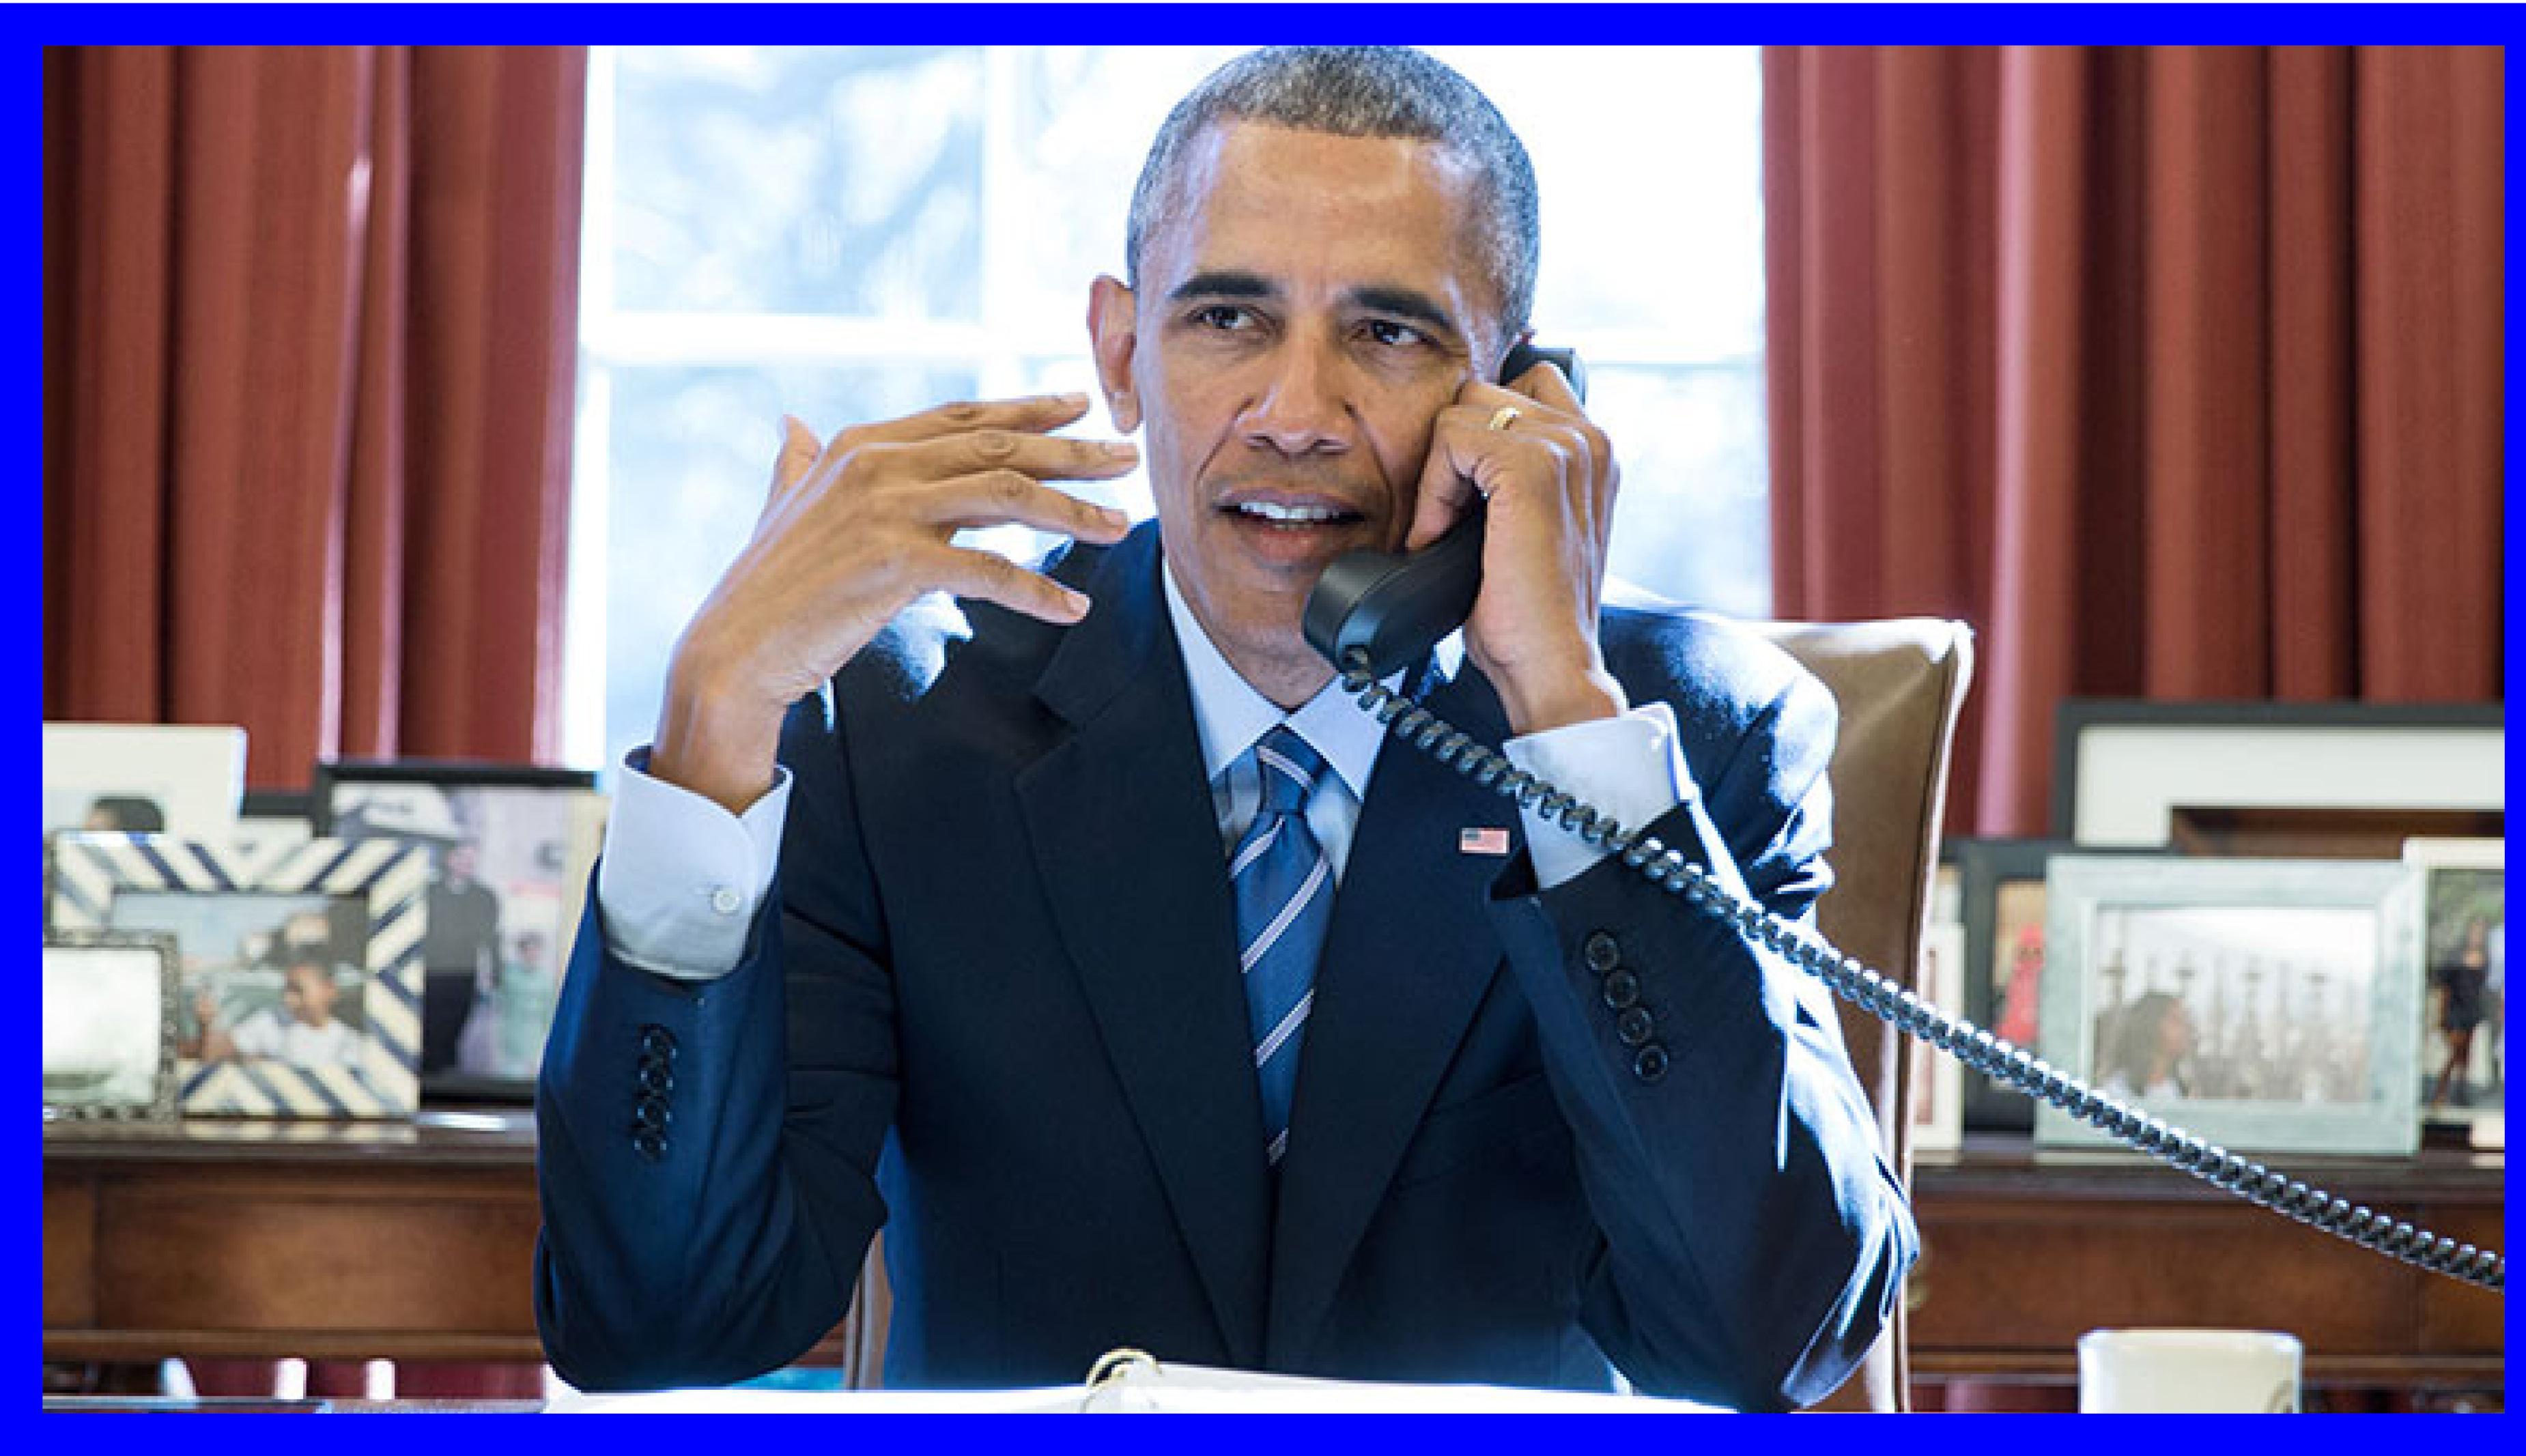 Barack Obama Politique étrangère2